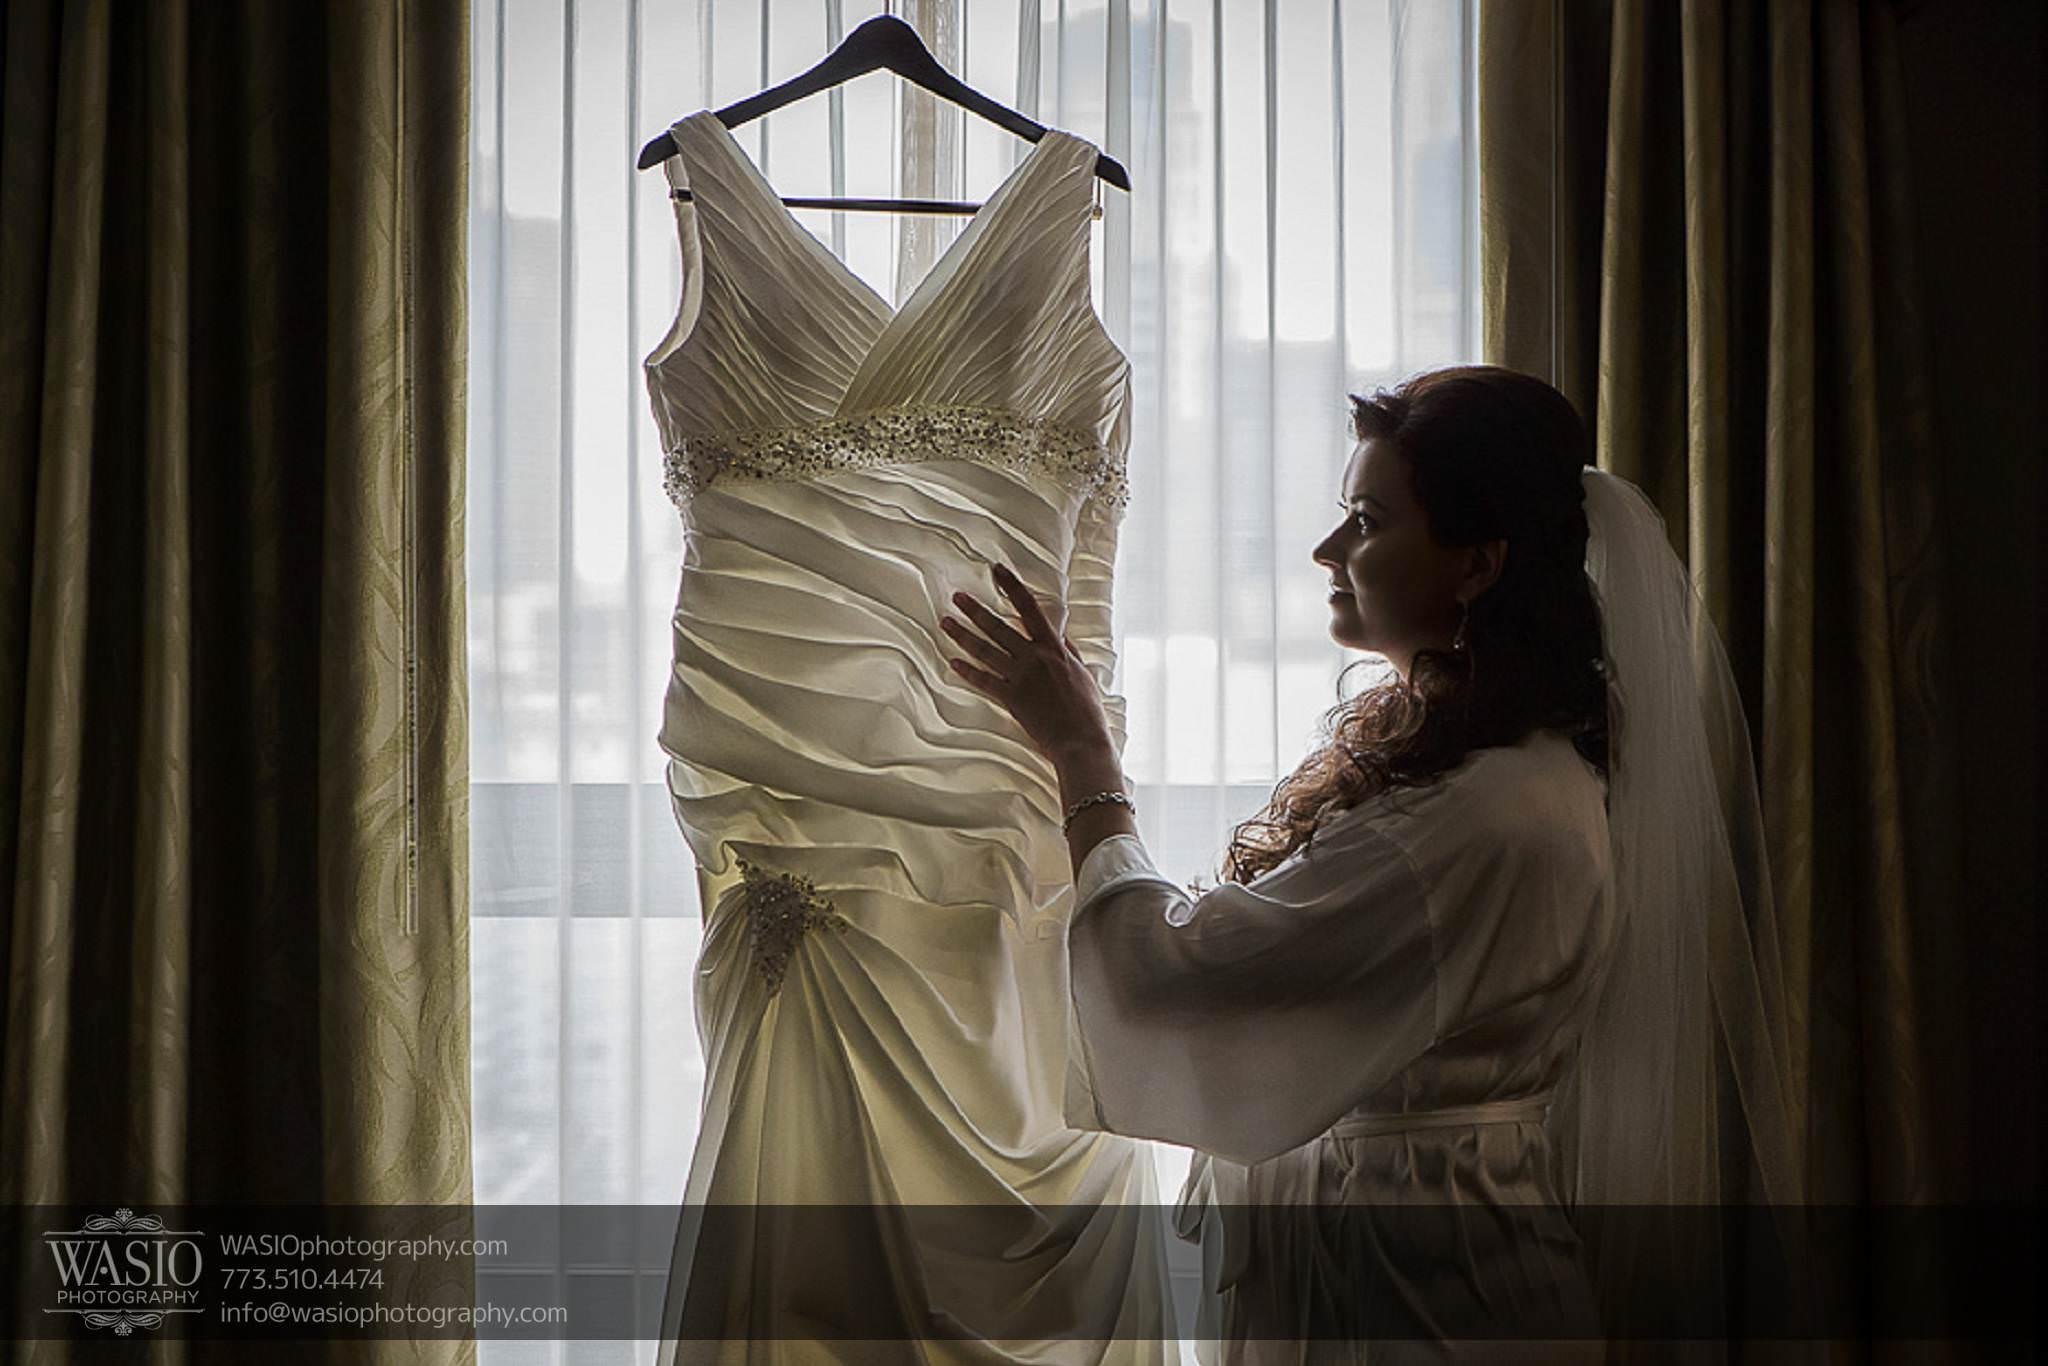 Chicago-wedding-photos-bride-bridal-wedding-dress-white-044 Chicago Wedding Photos - Svetlana + Yuriy